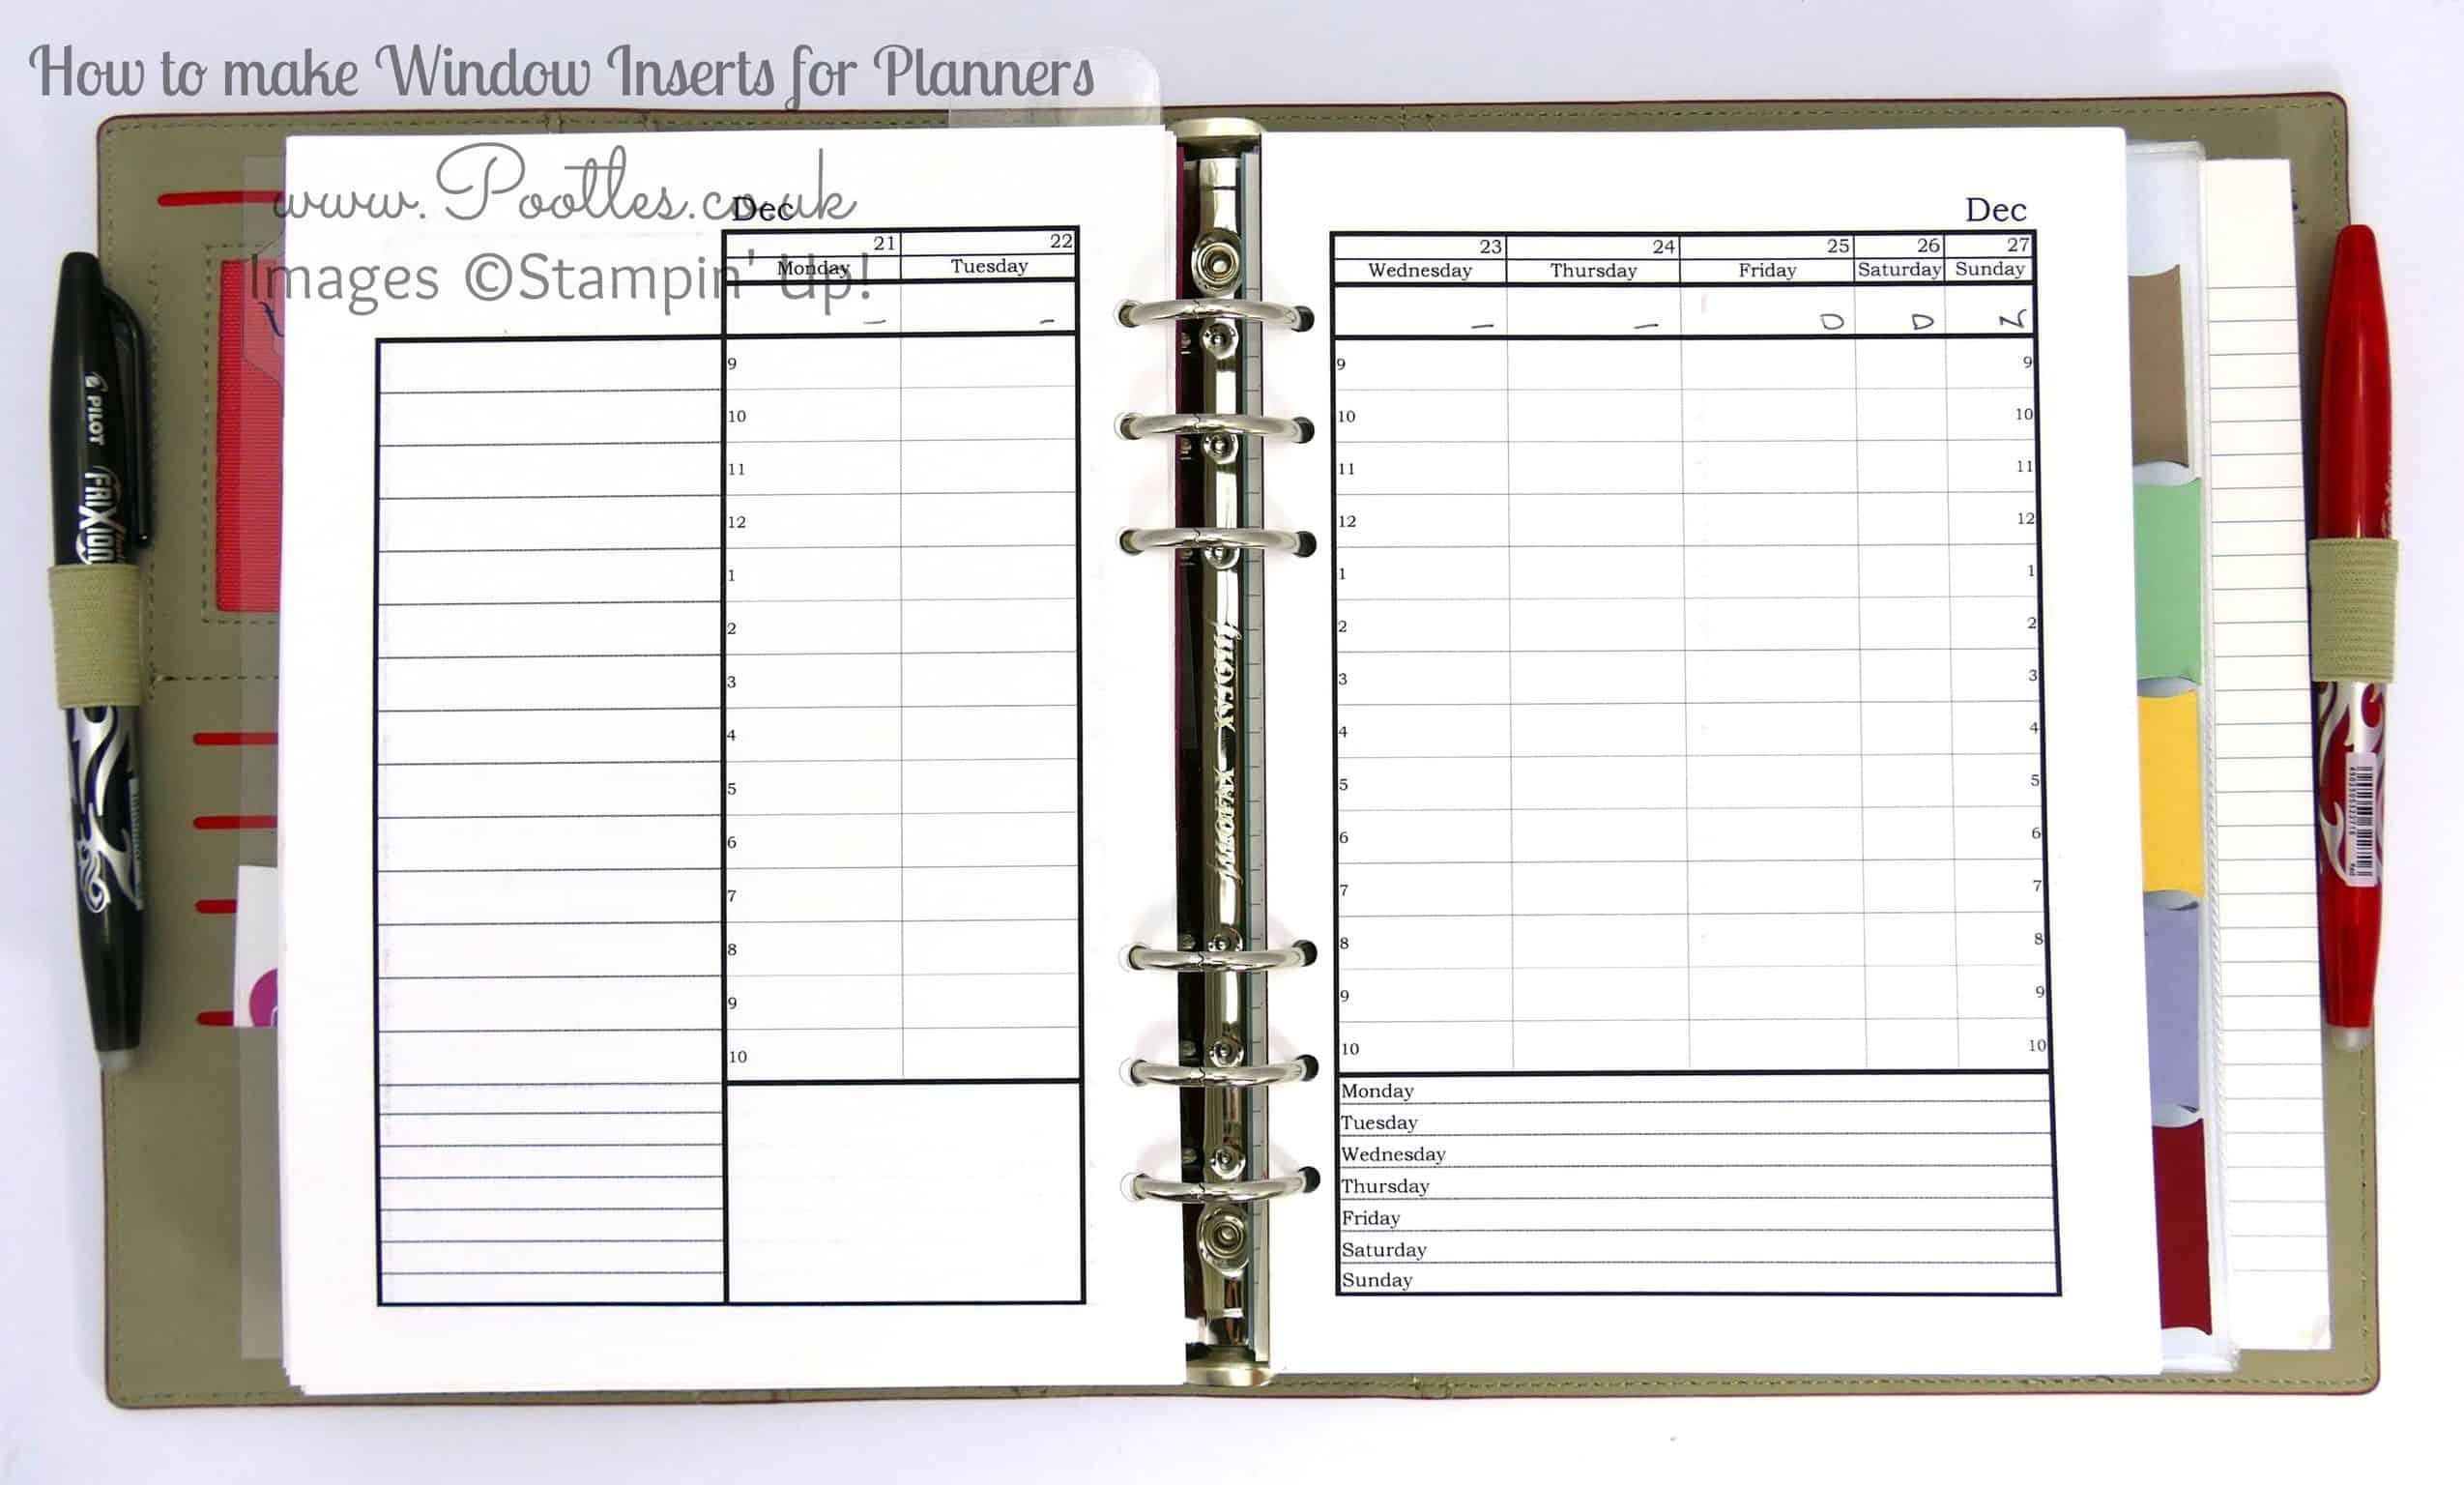 Stampin' Up! Demonstrator Pootles - Diary Planner Insert ...